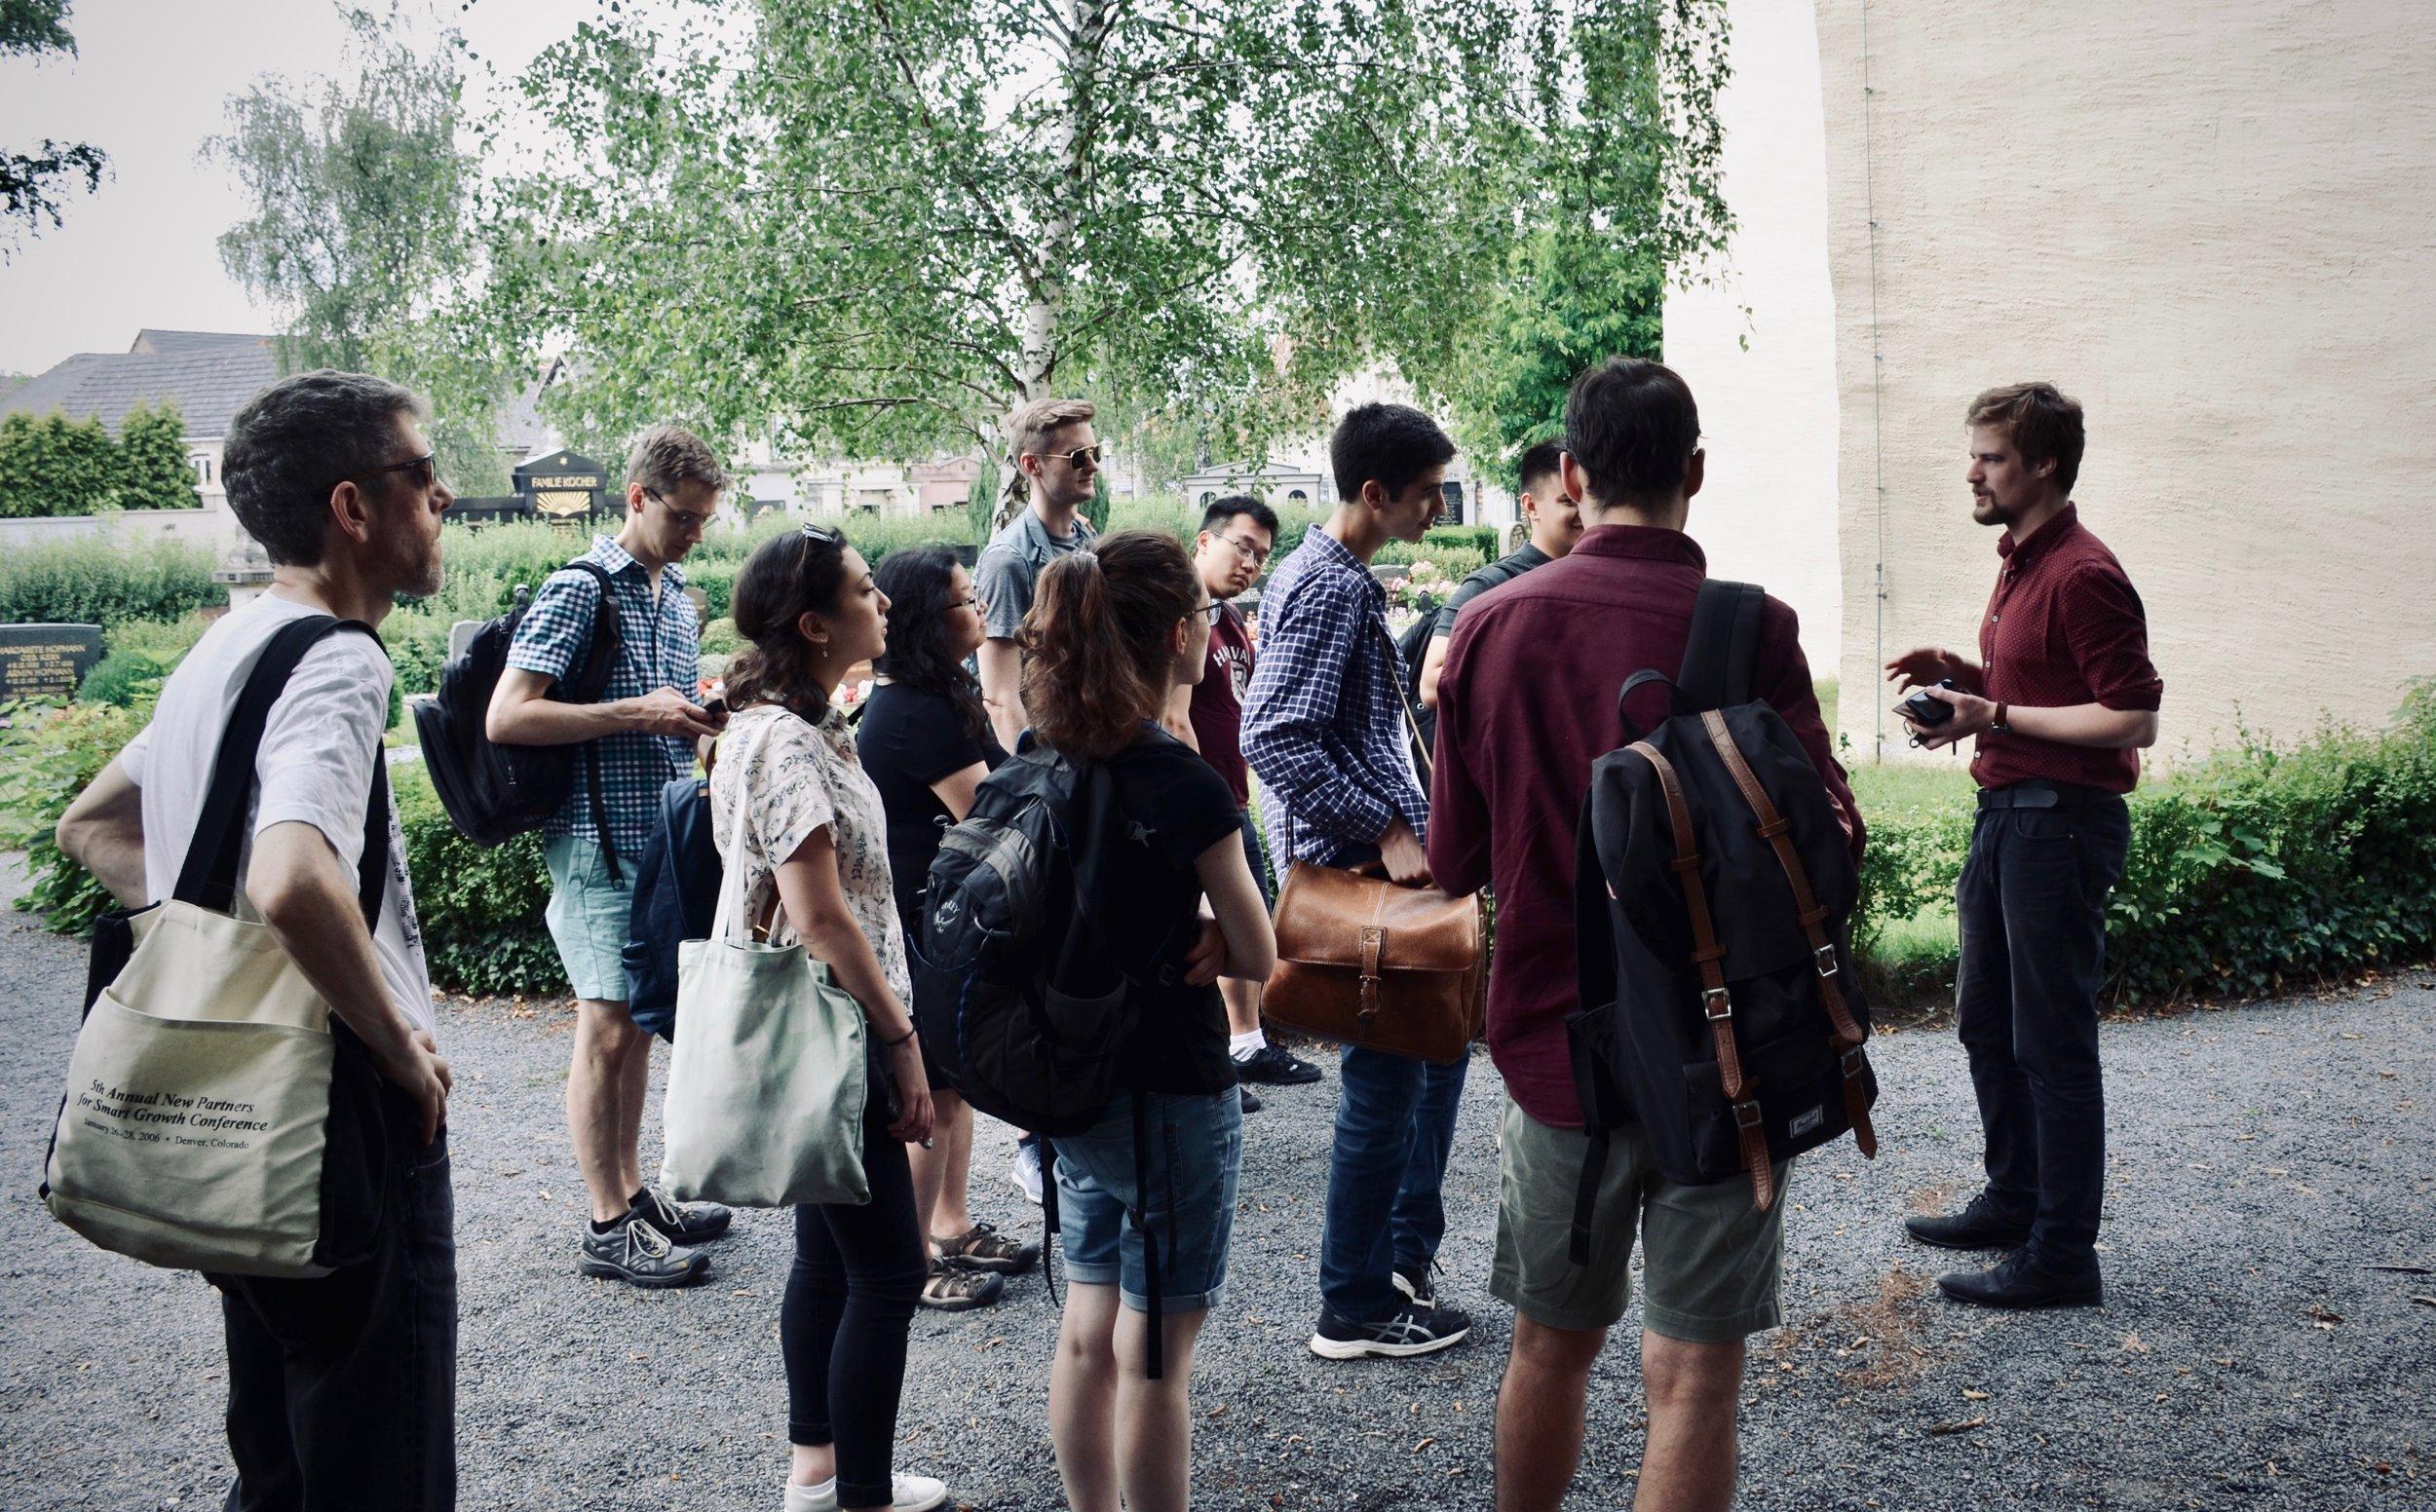 Martin Sturm welcomes members of Boston Organ Studio to Pomßen, Germany.